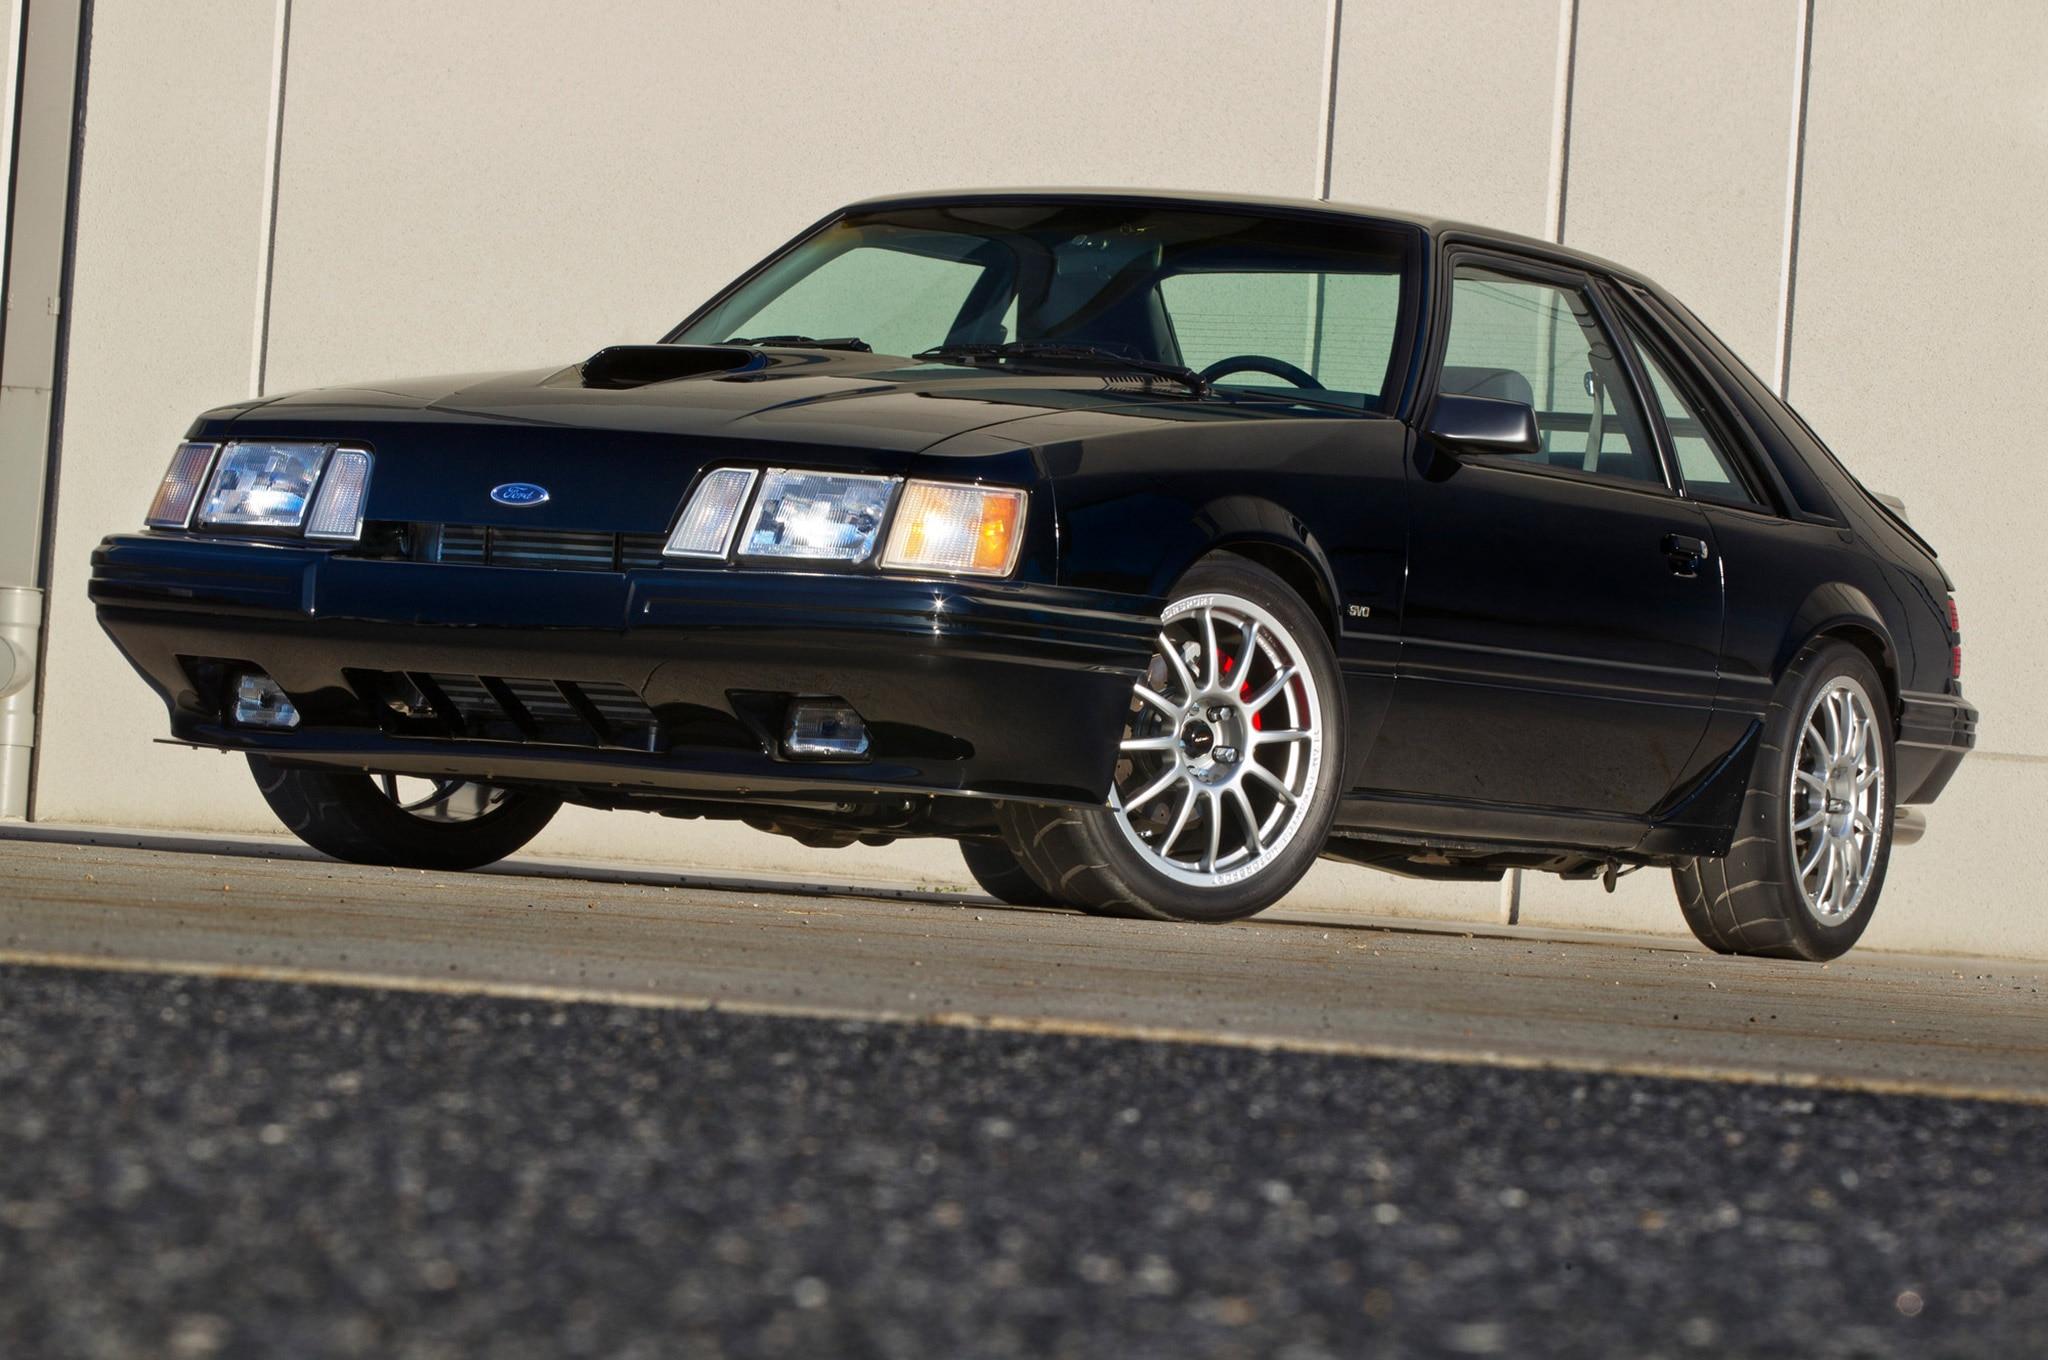 1986 Ford Mustang Svo 03